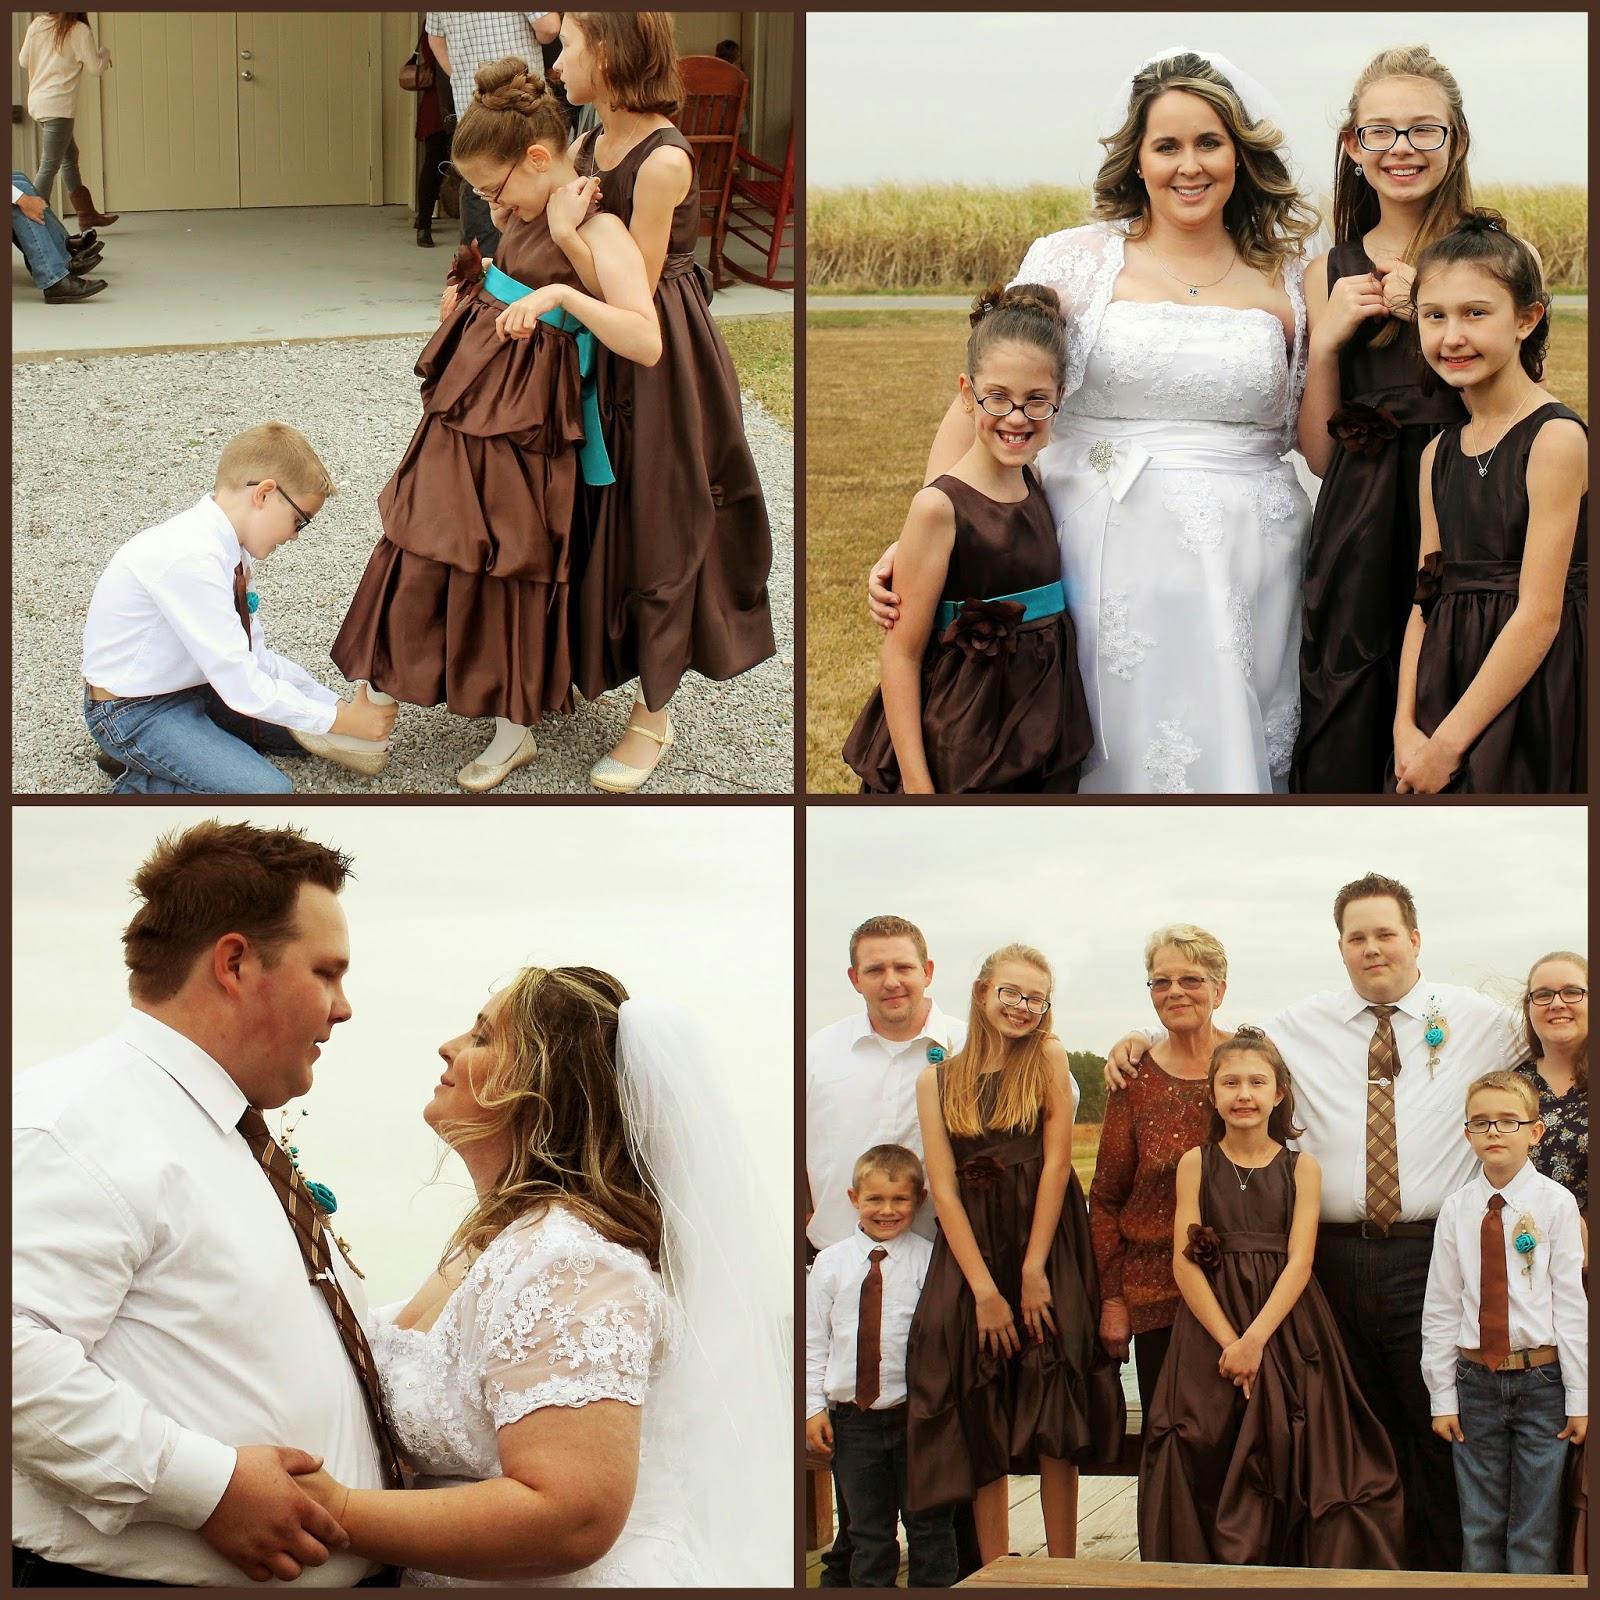 Wedding_Brown And Teal_Burlap_Flower Girl